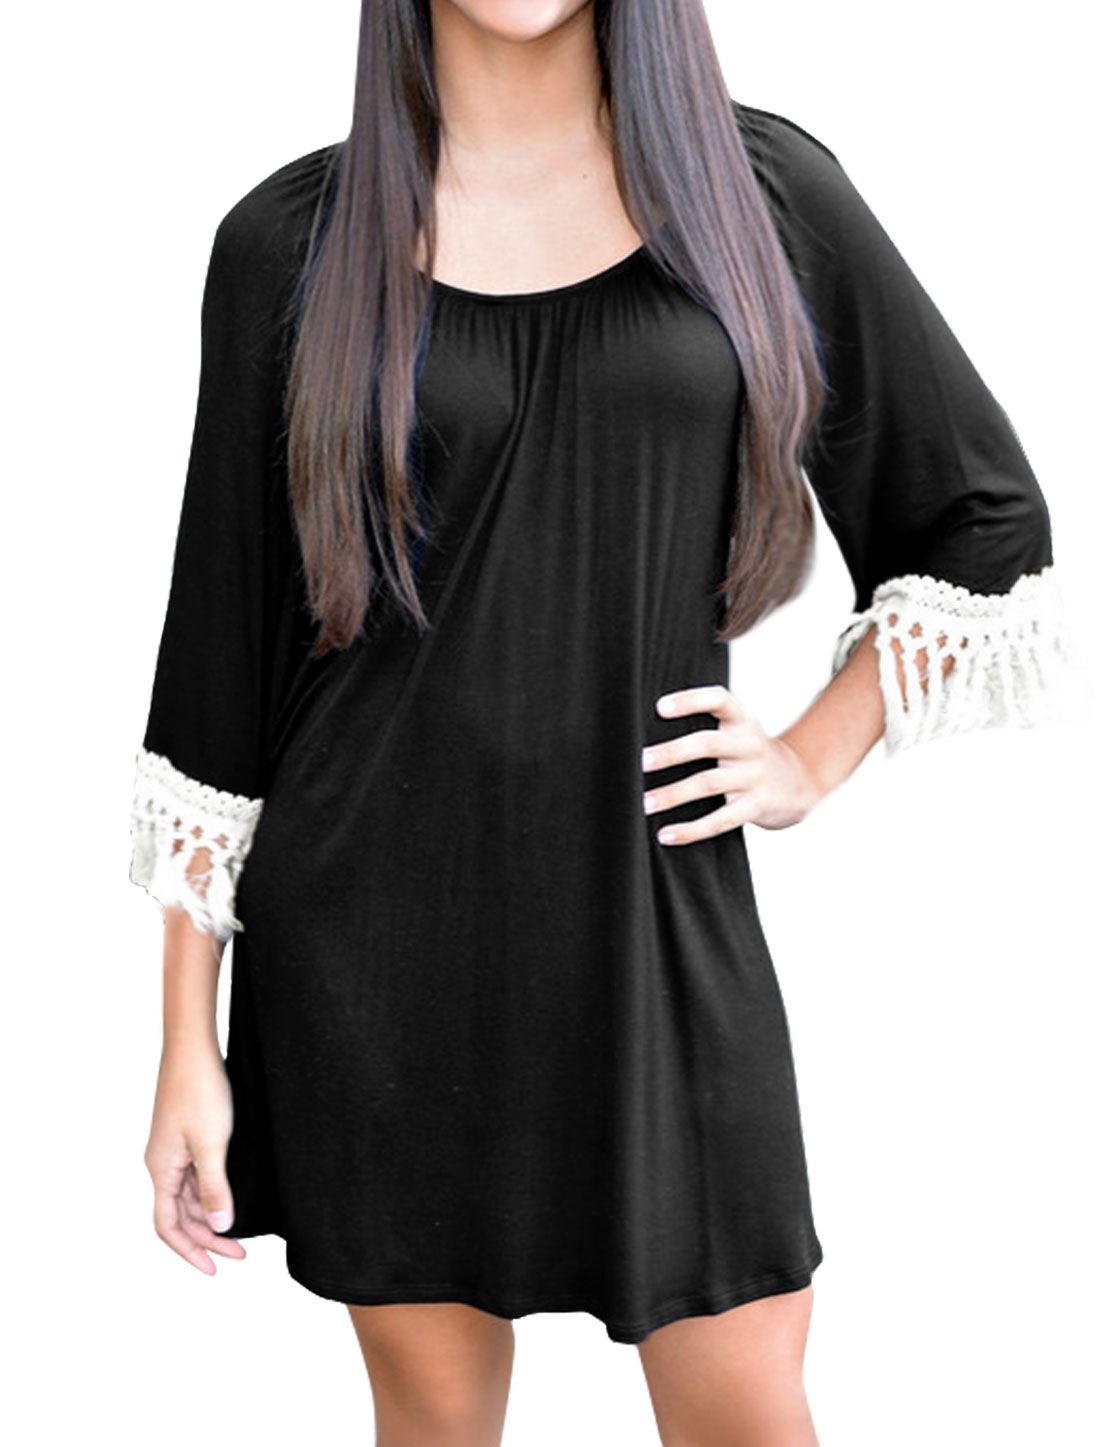 Women 3/4 Sleeves Tassels Loose Tunic Dresss Black S